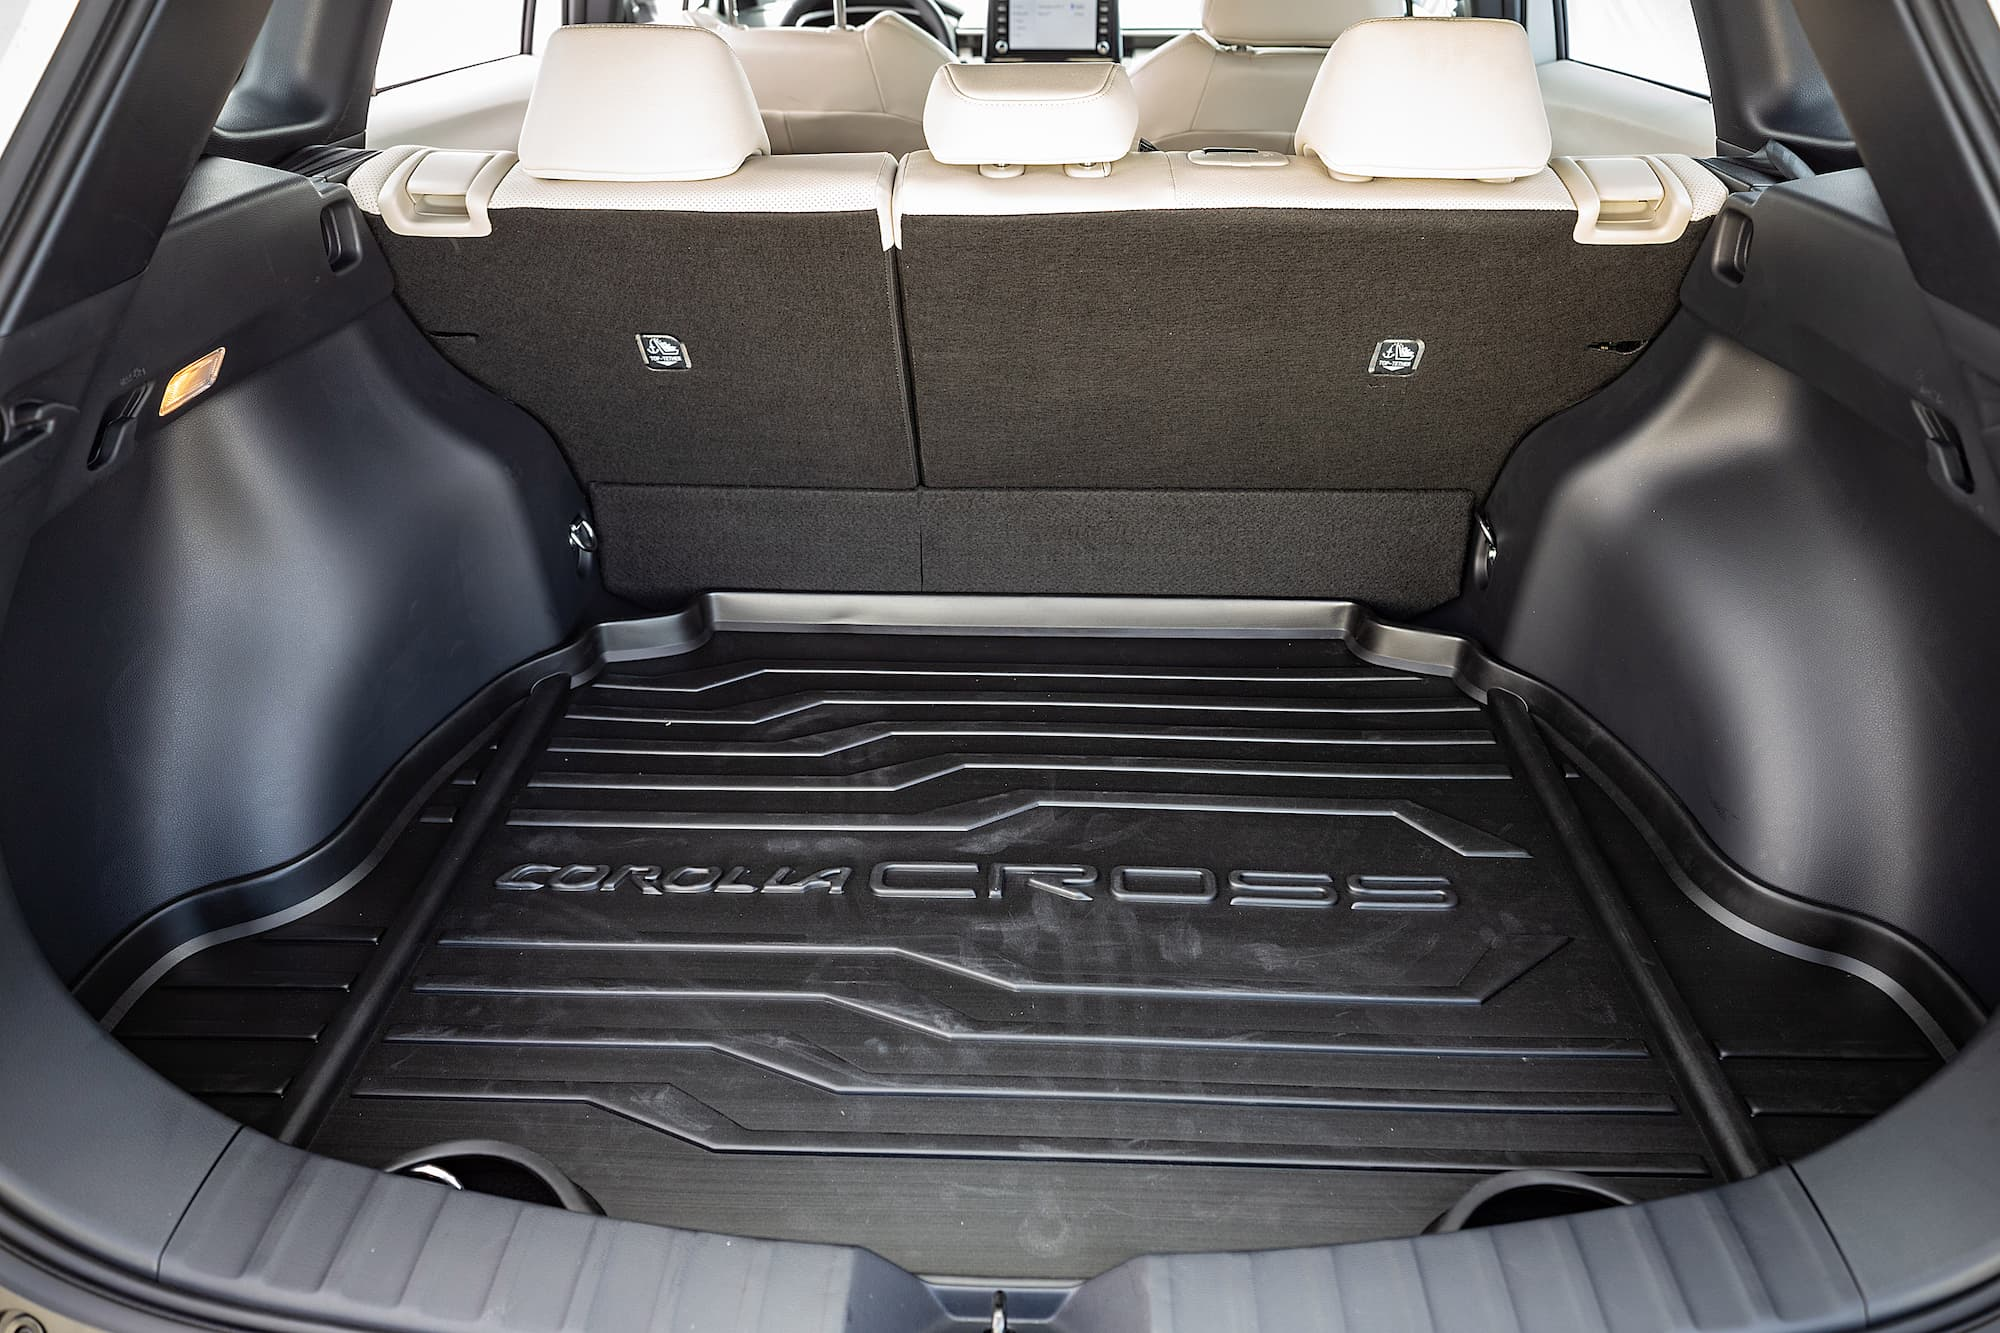 Porta-malas do Toyota Corolla Cross